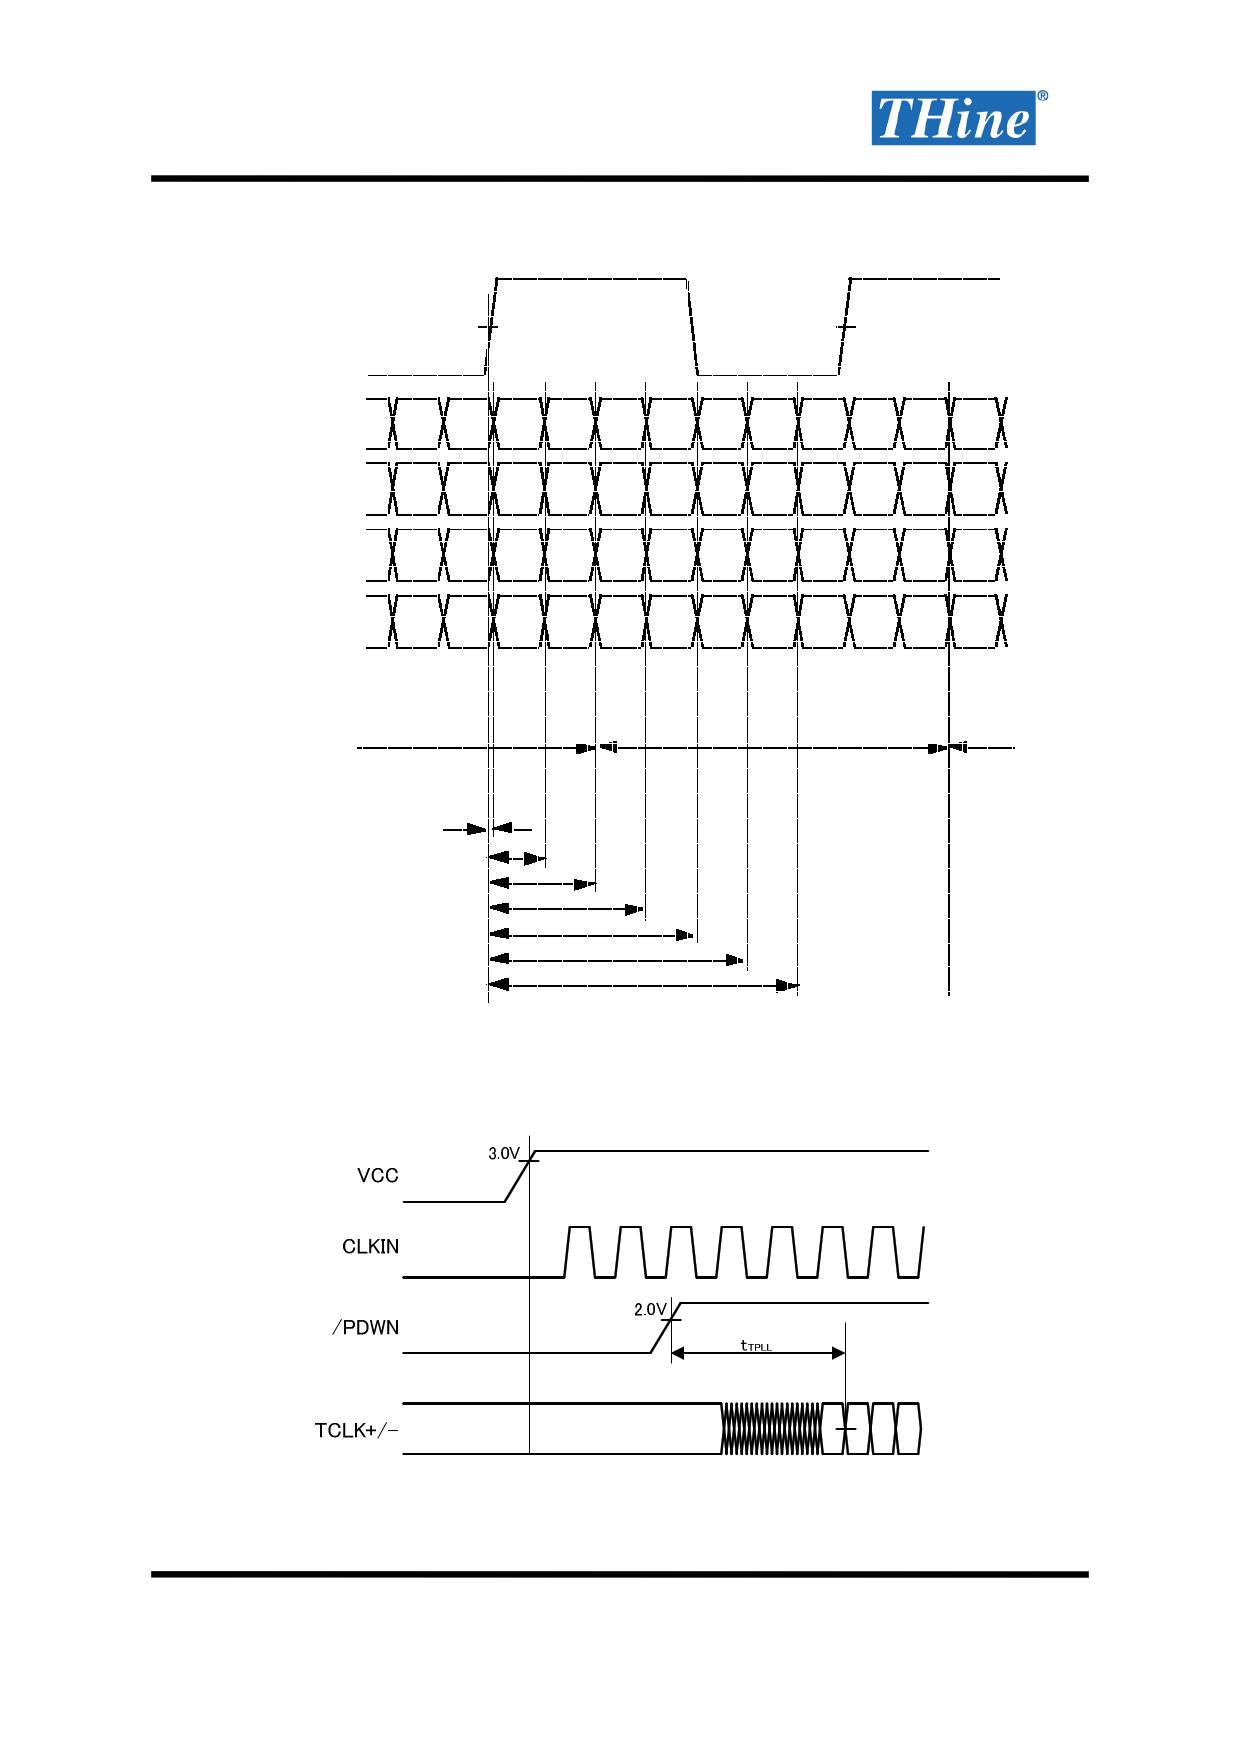 THC63LVD103D transistor, diode fet, igbt, scr